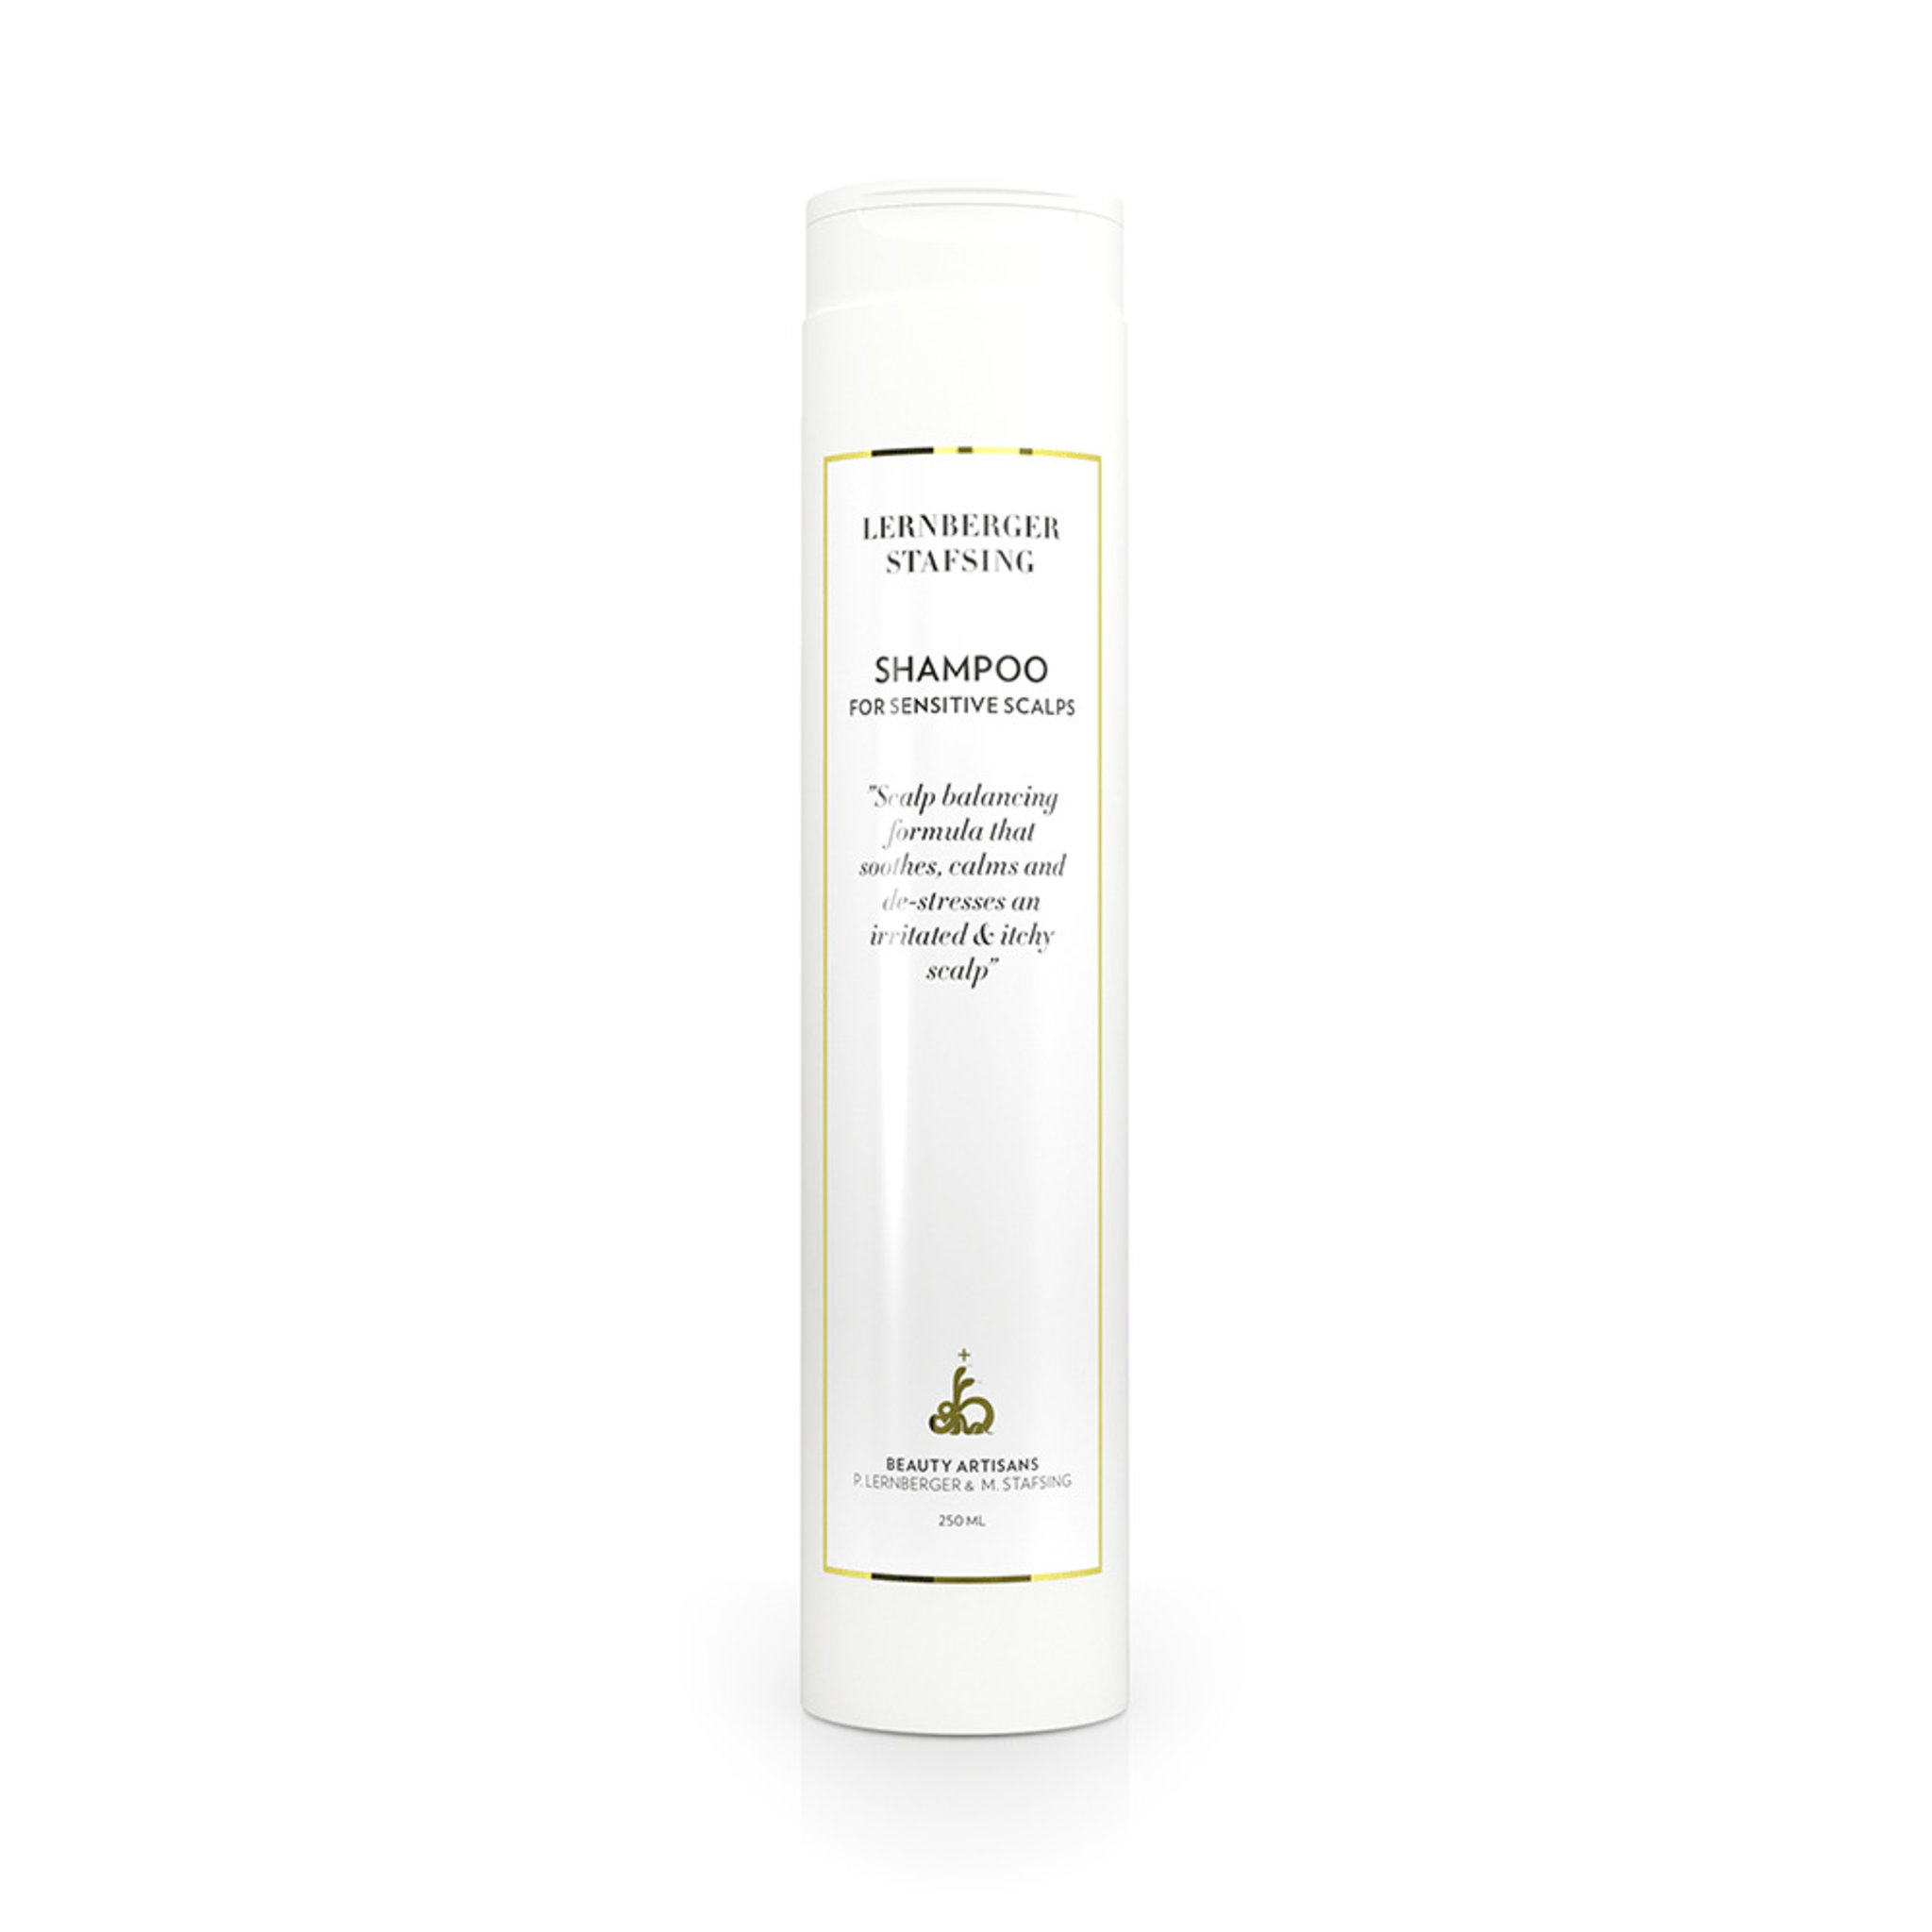 lernberger stafsing shampoo recension